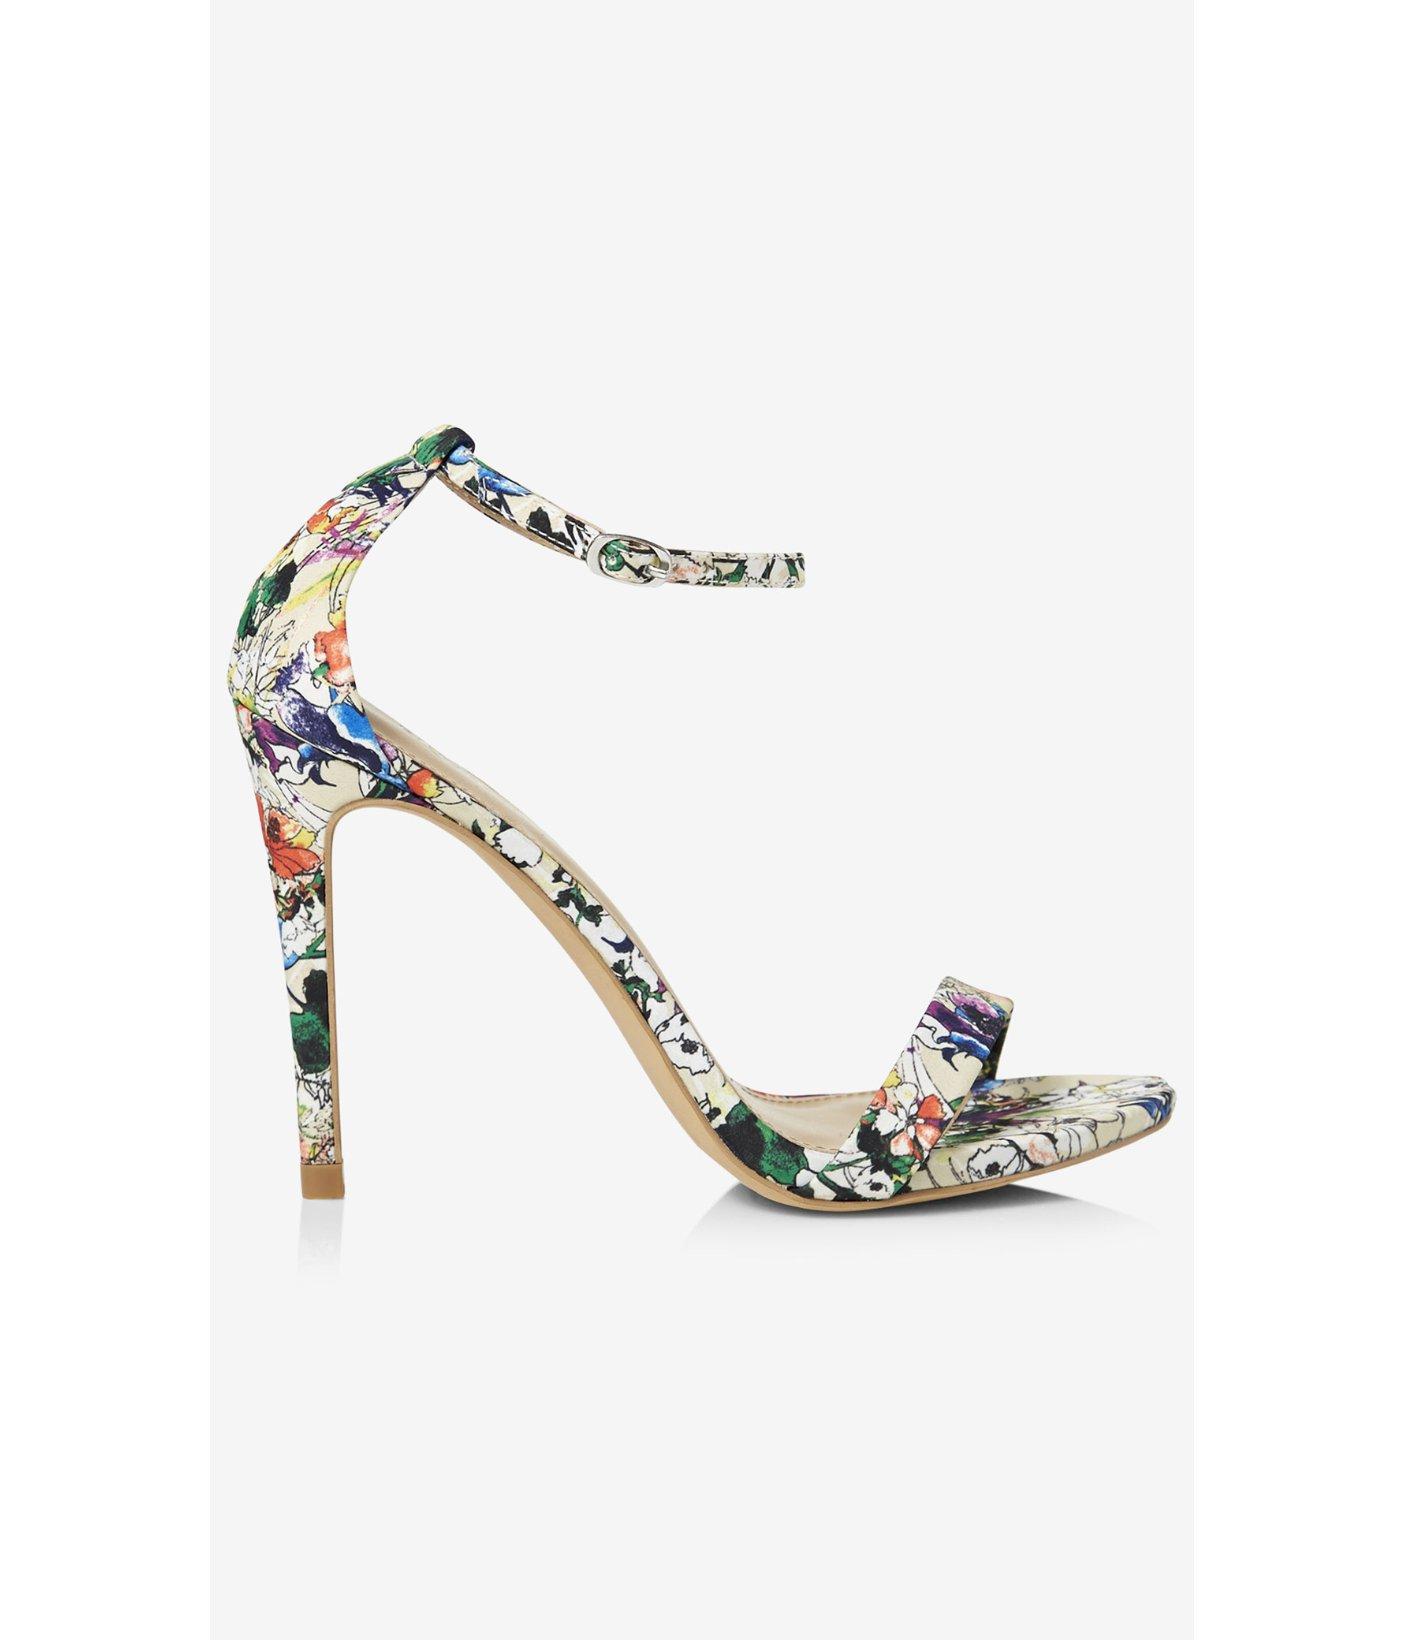 ecf6ec17c9ec Lyst - Express Watercolor Floral Sleek Heeled Sandal in White